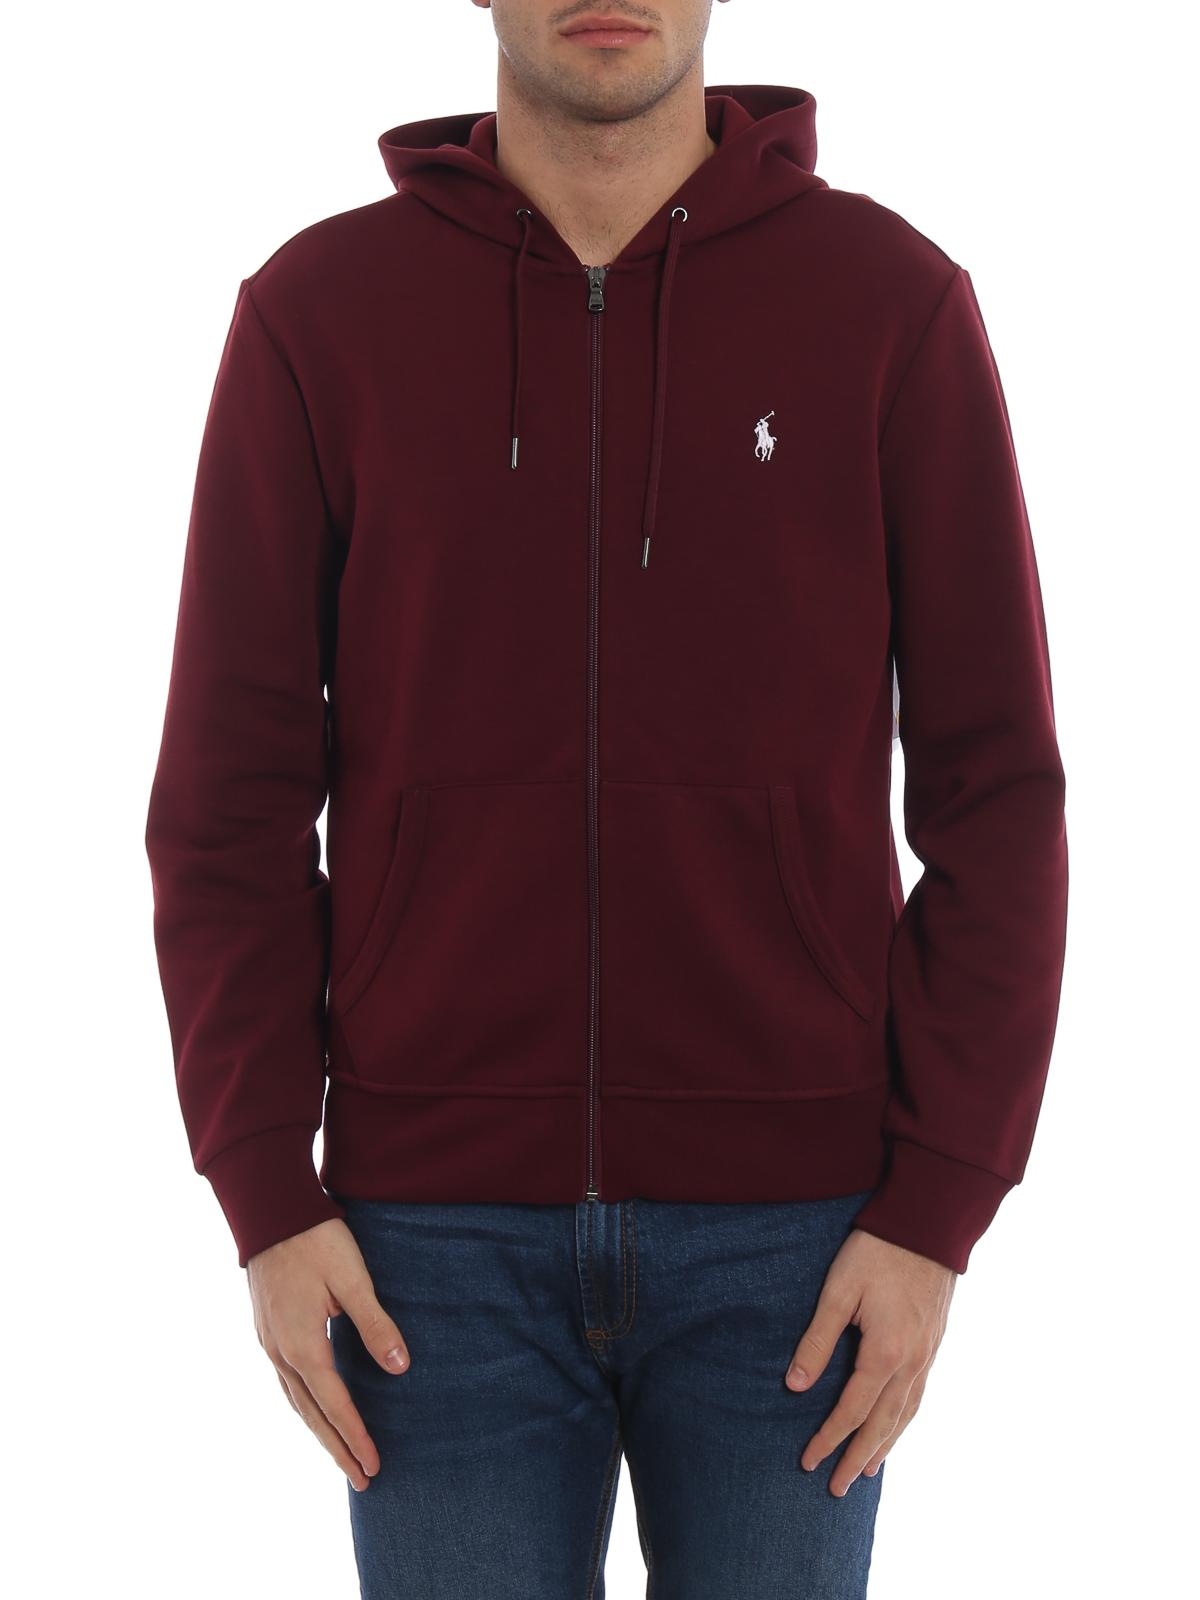 401be448 Polo Ralph Lauren - Performance burgundy zip-up hoodie - Sweatshirts ...